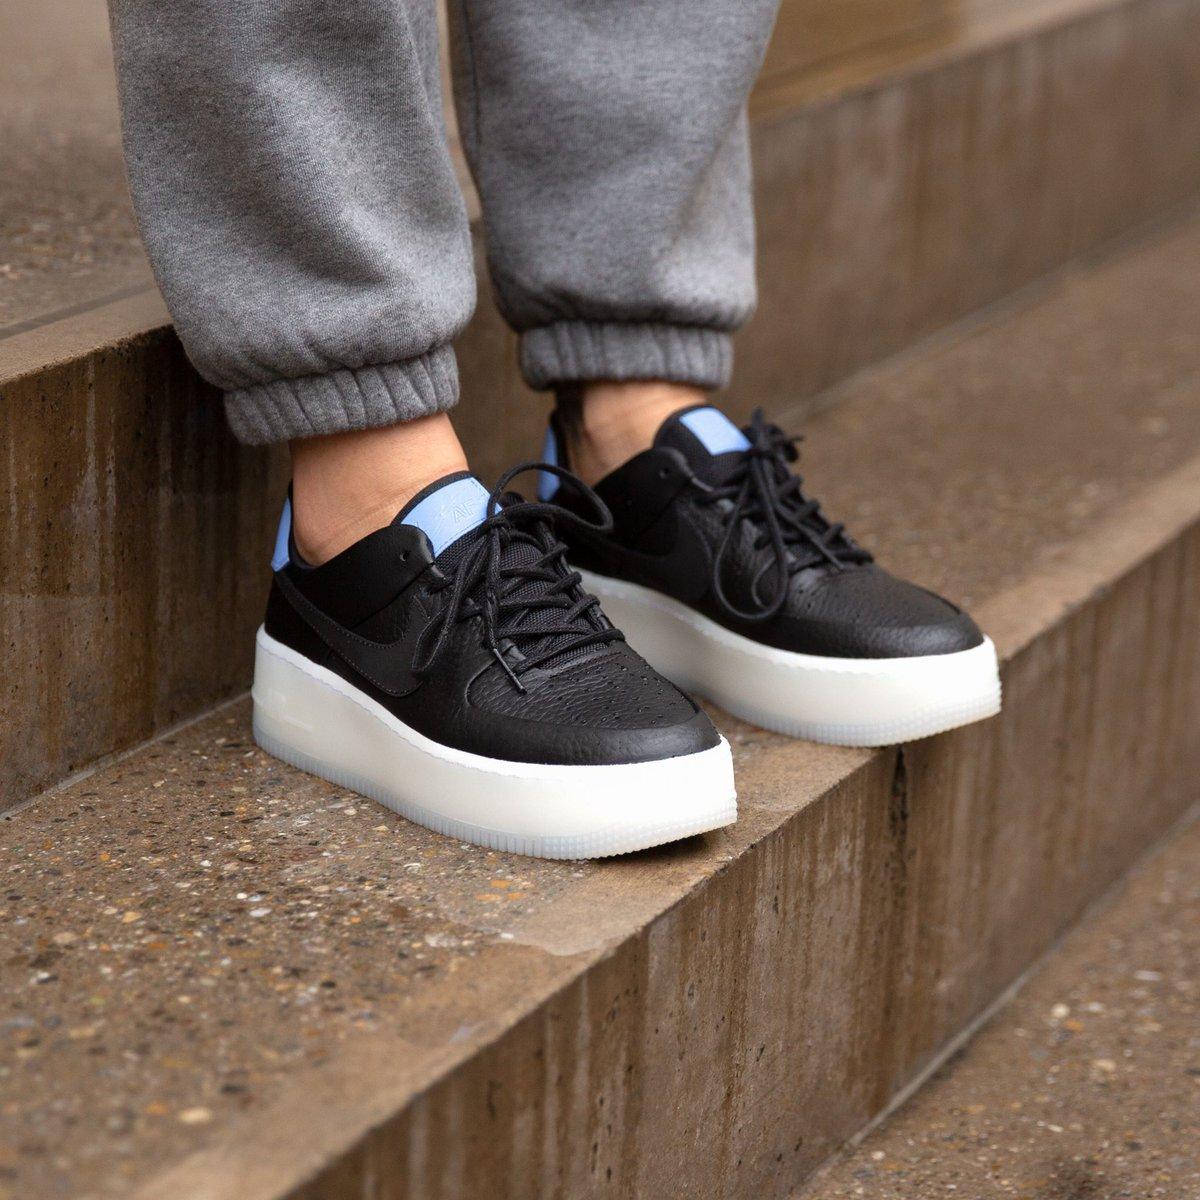 on #sale ❗ Nike Wmns Air Force 1 Sage Low Lx BlackRoyal